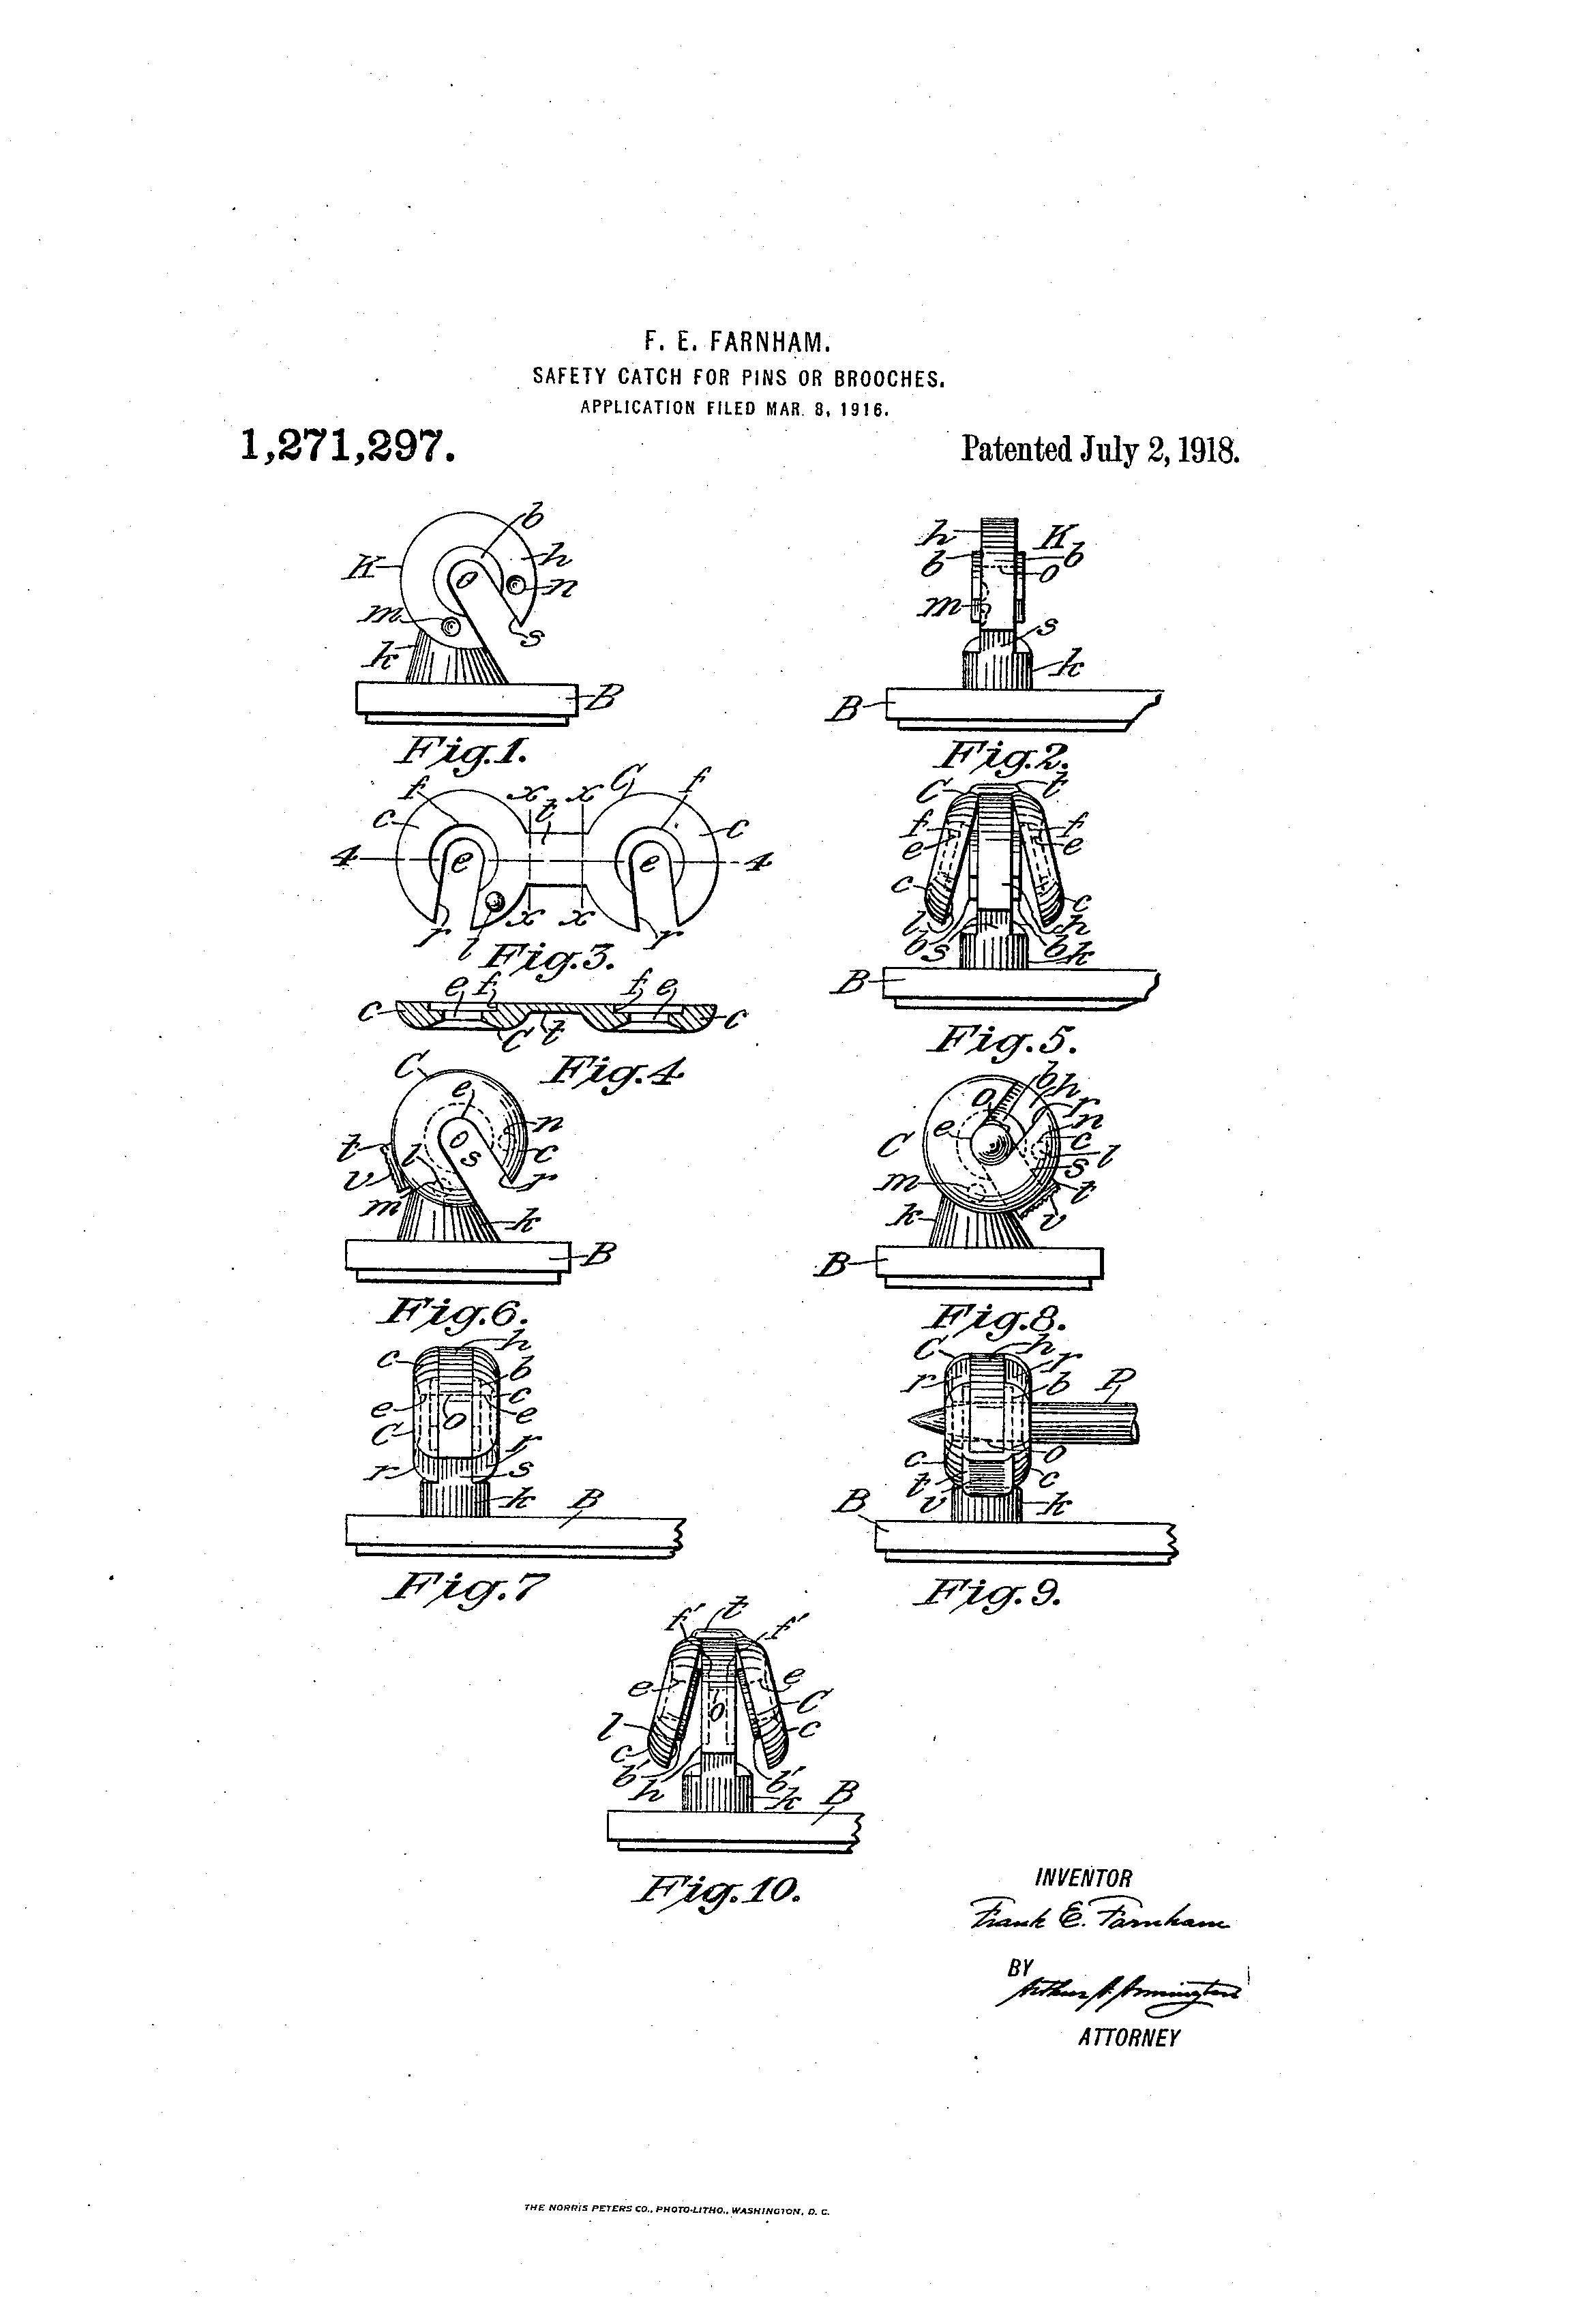 Safety catch diagram